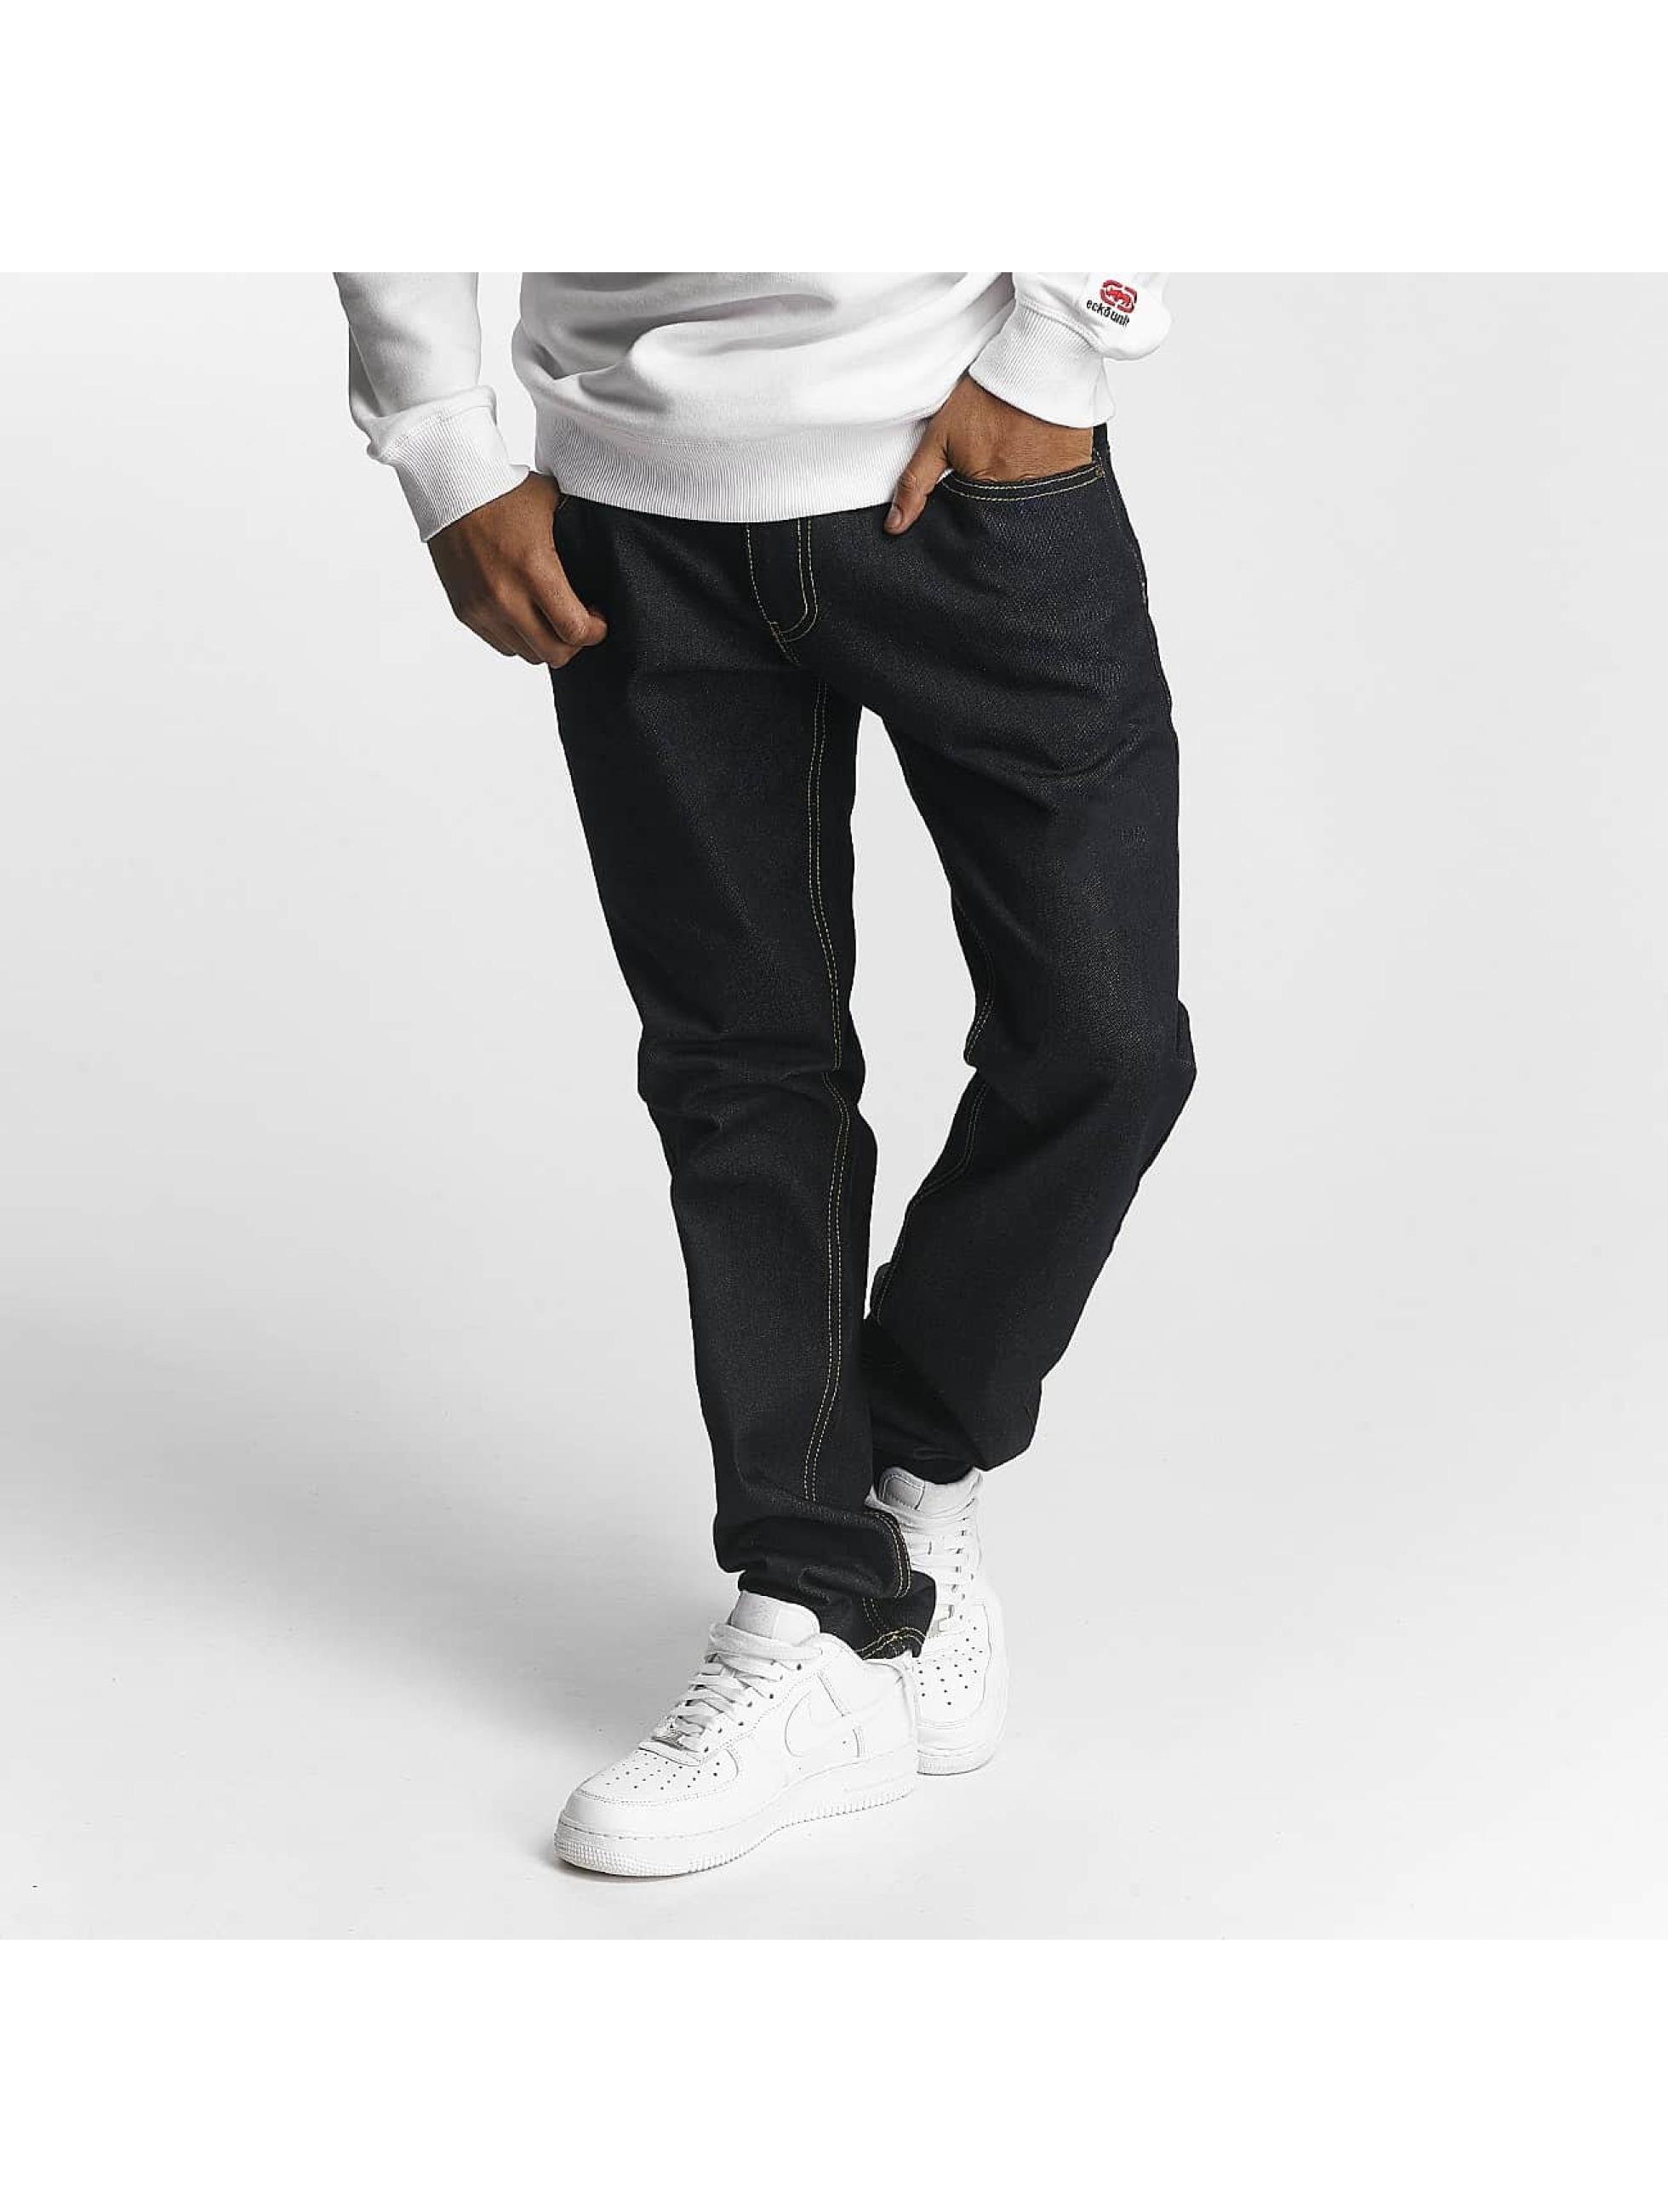 Ecko Unltd. / Loose Fit Jeans Gordon's Lo in indigo W 42 L 34